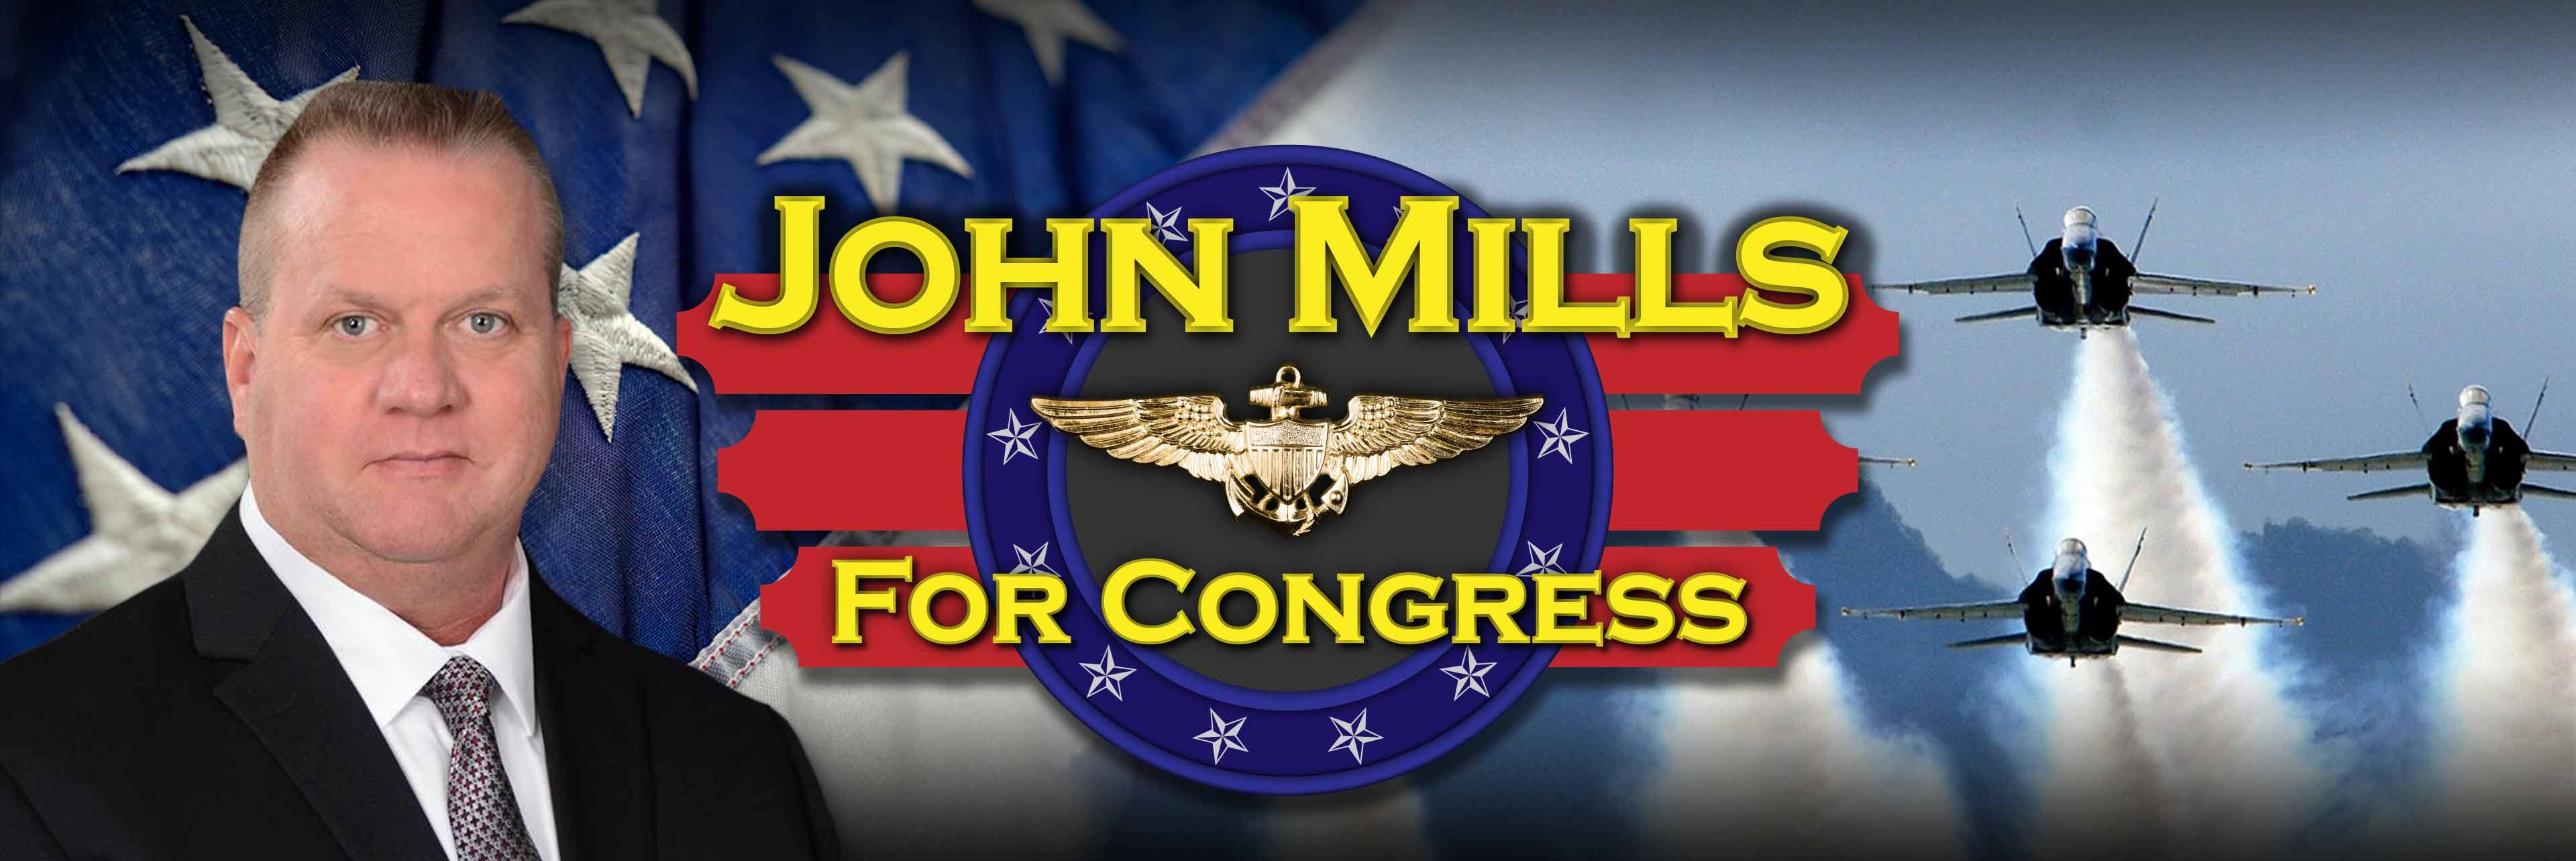 John Mills for Congress Banner